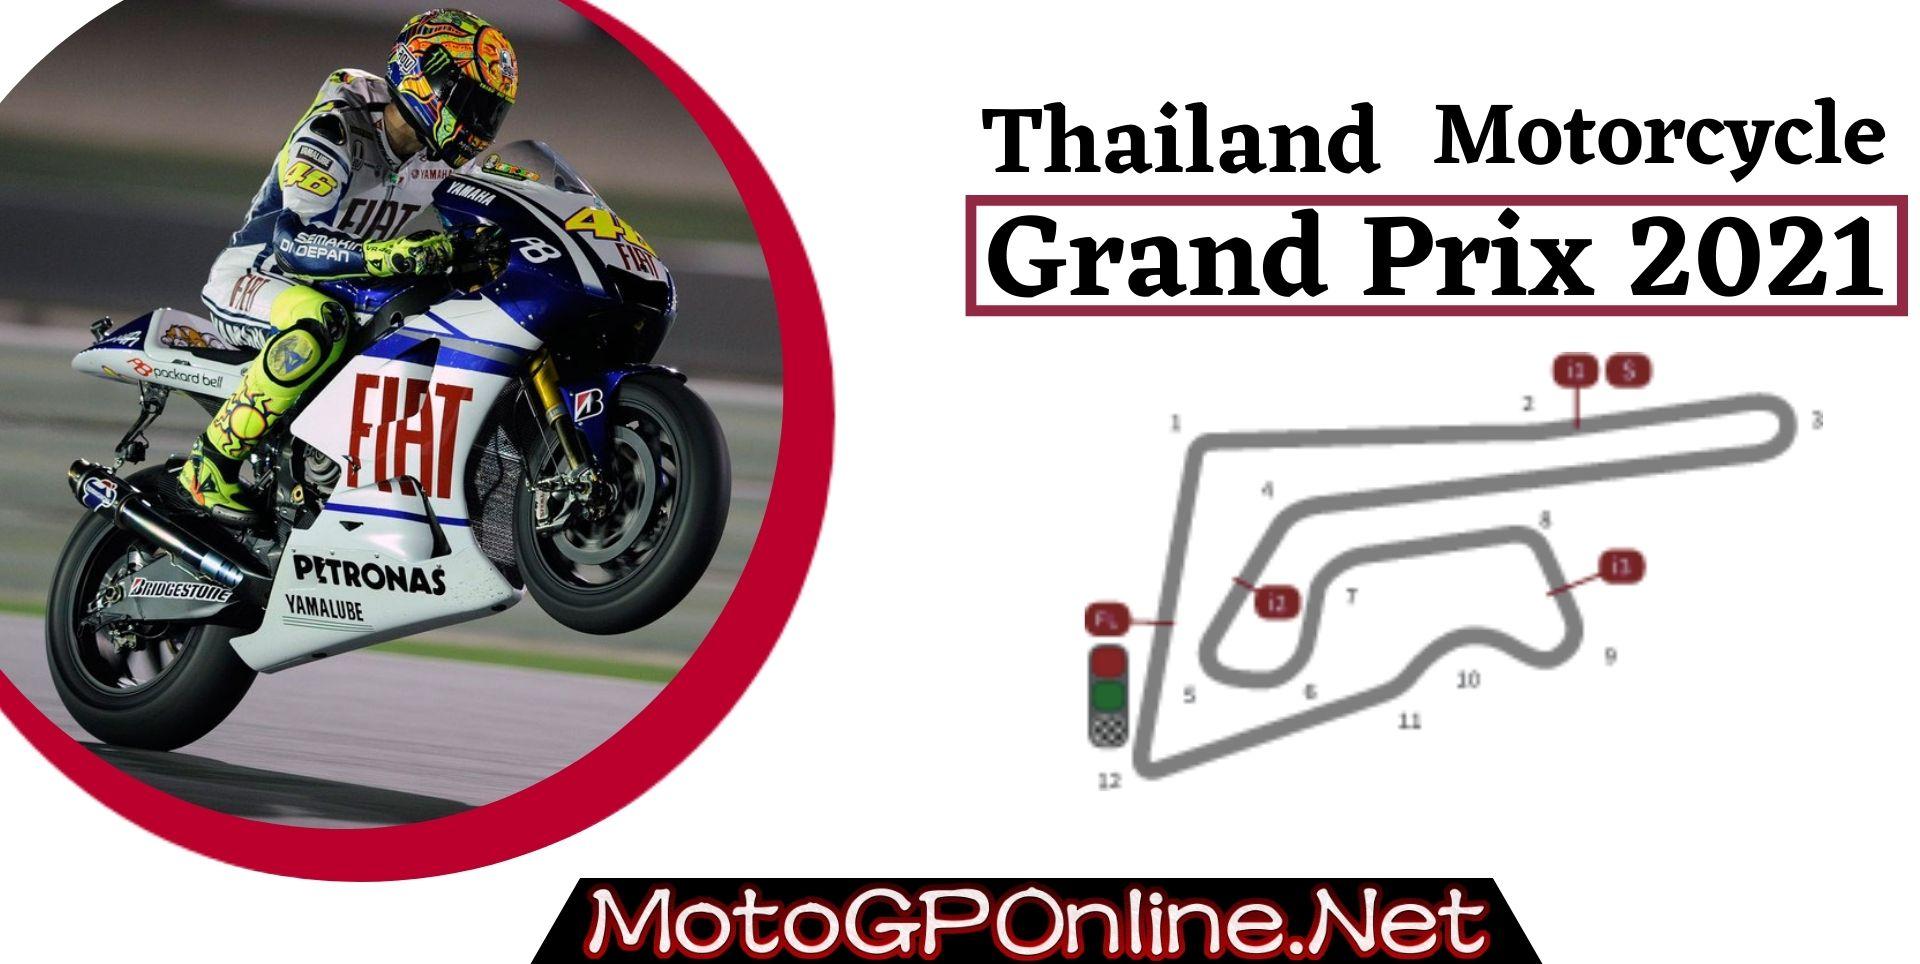 Thailand Grand Prix Live Stream MotoGP 2021 | Full Race Replay